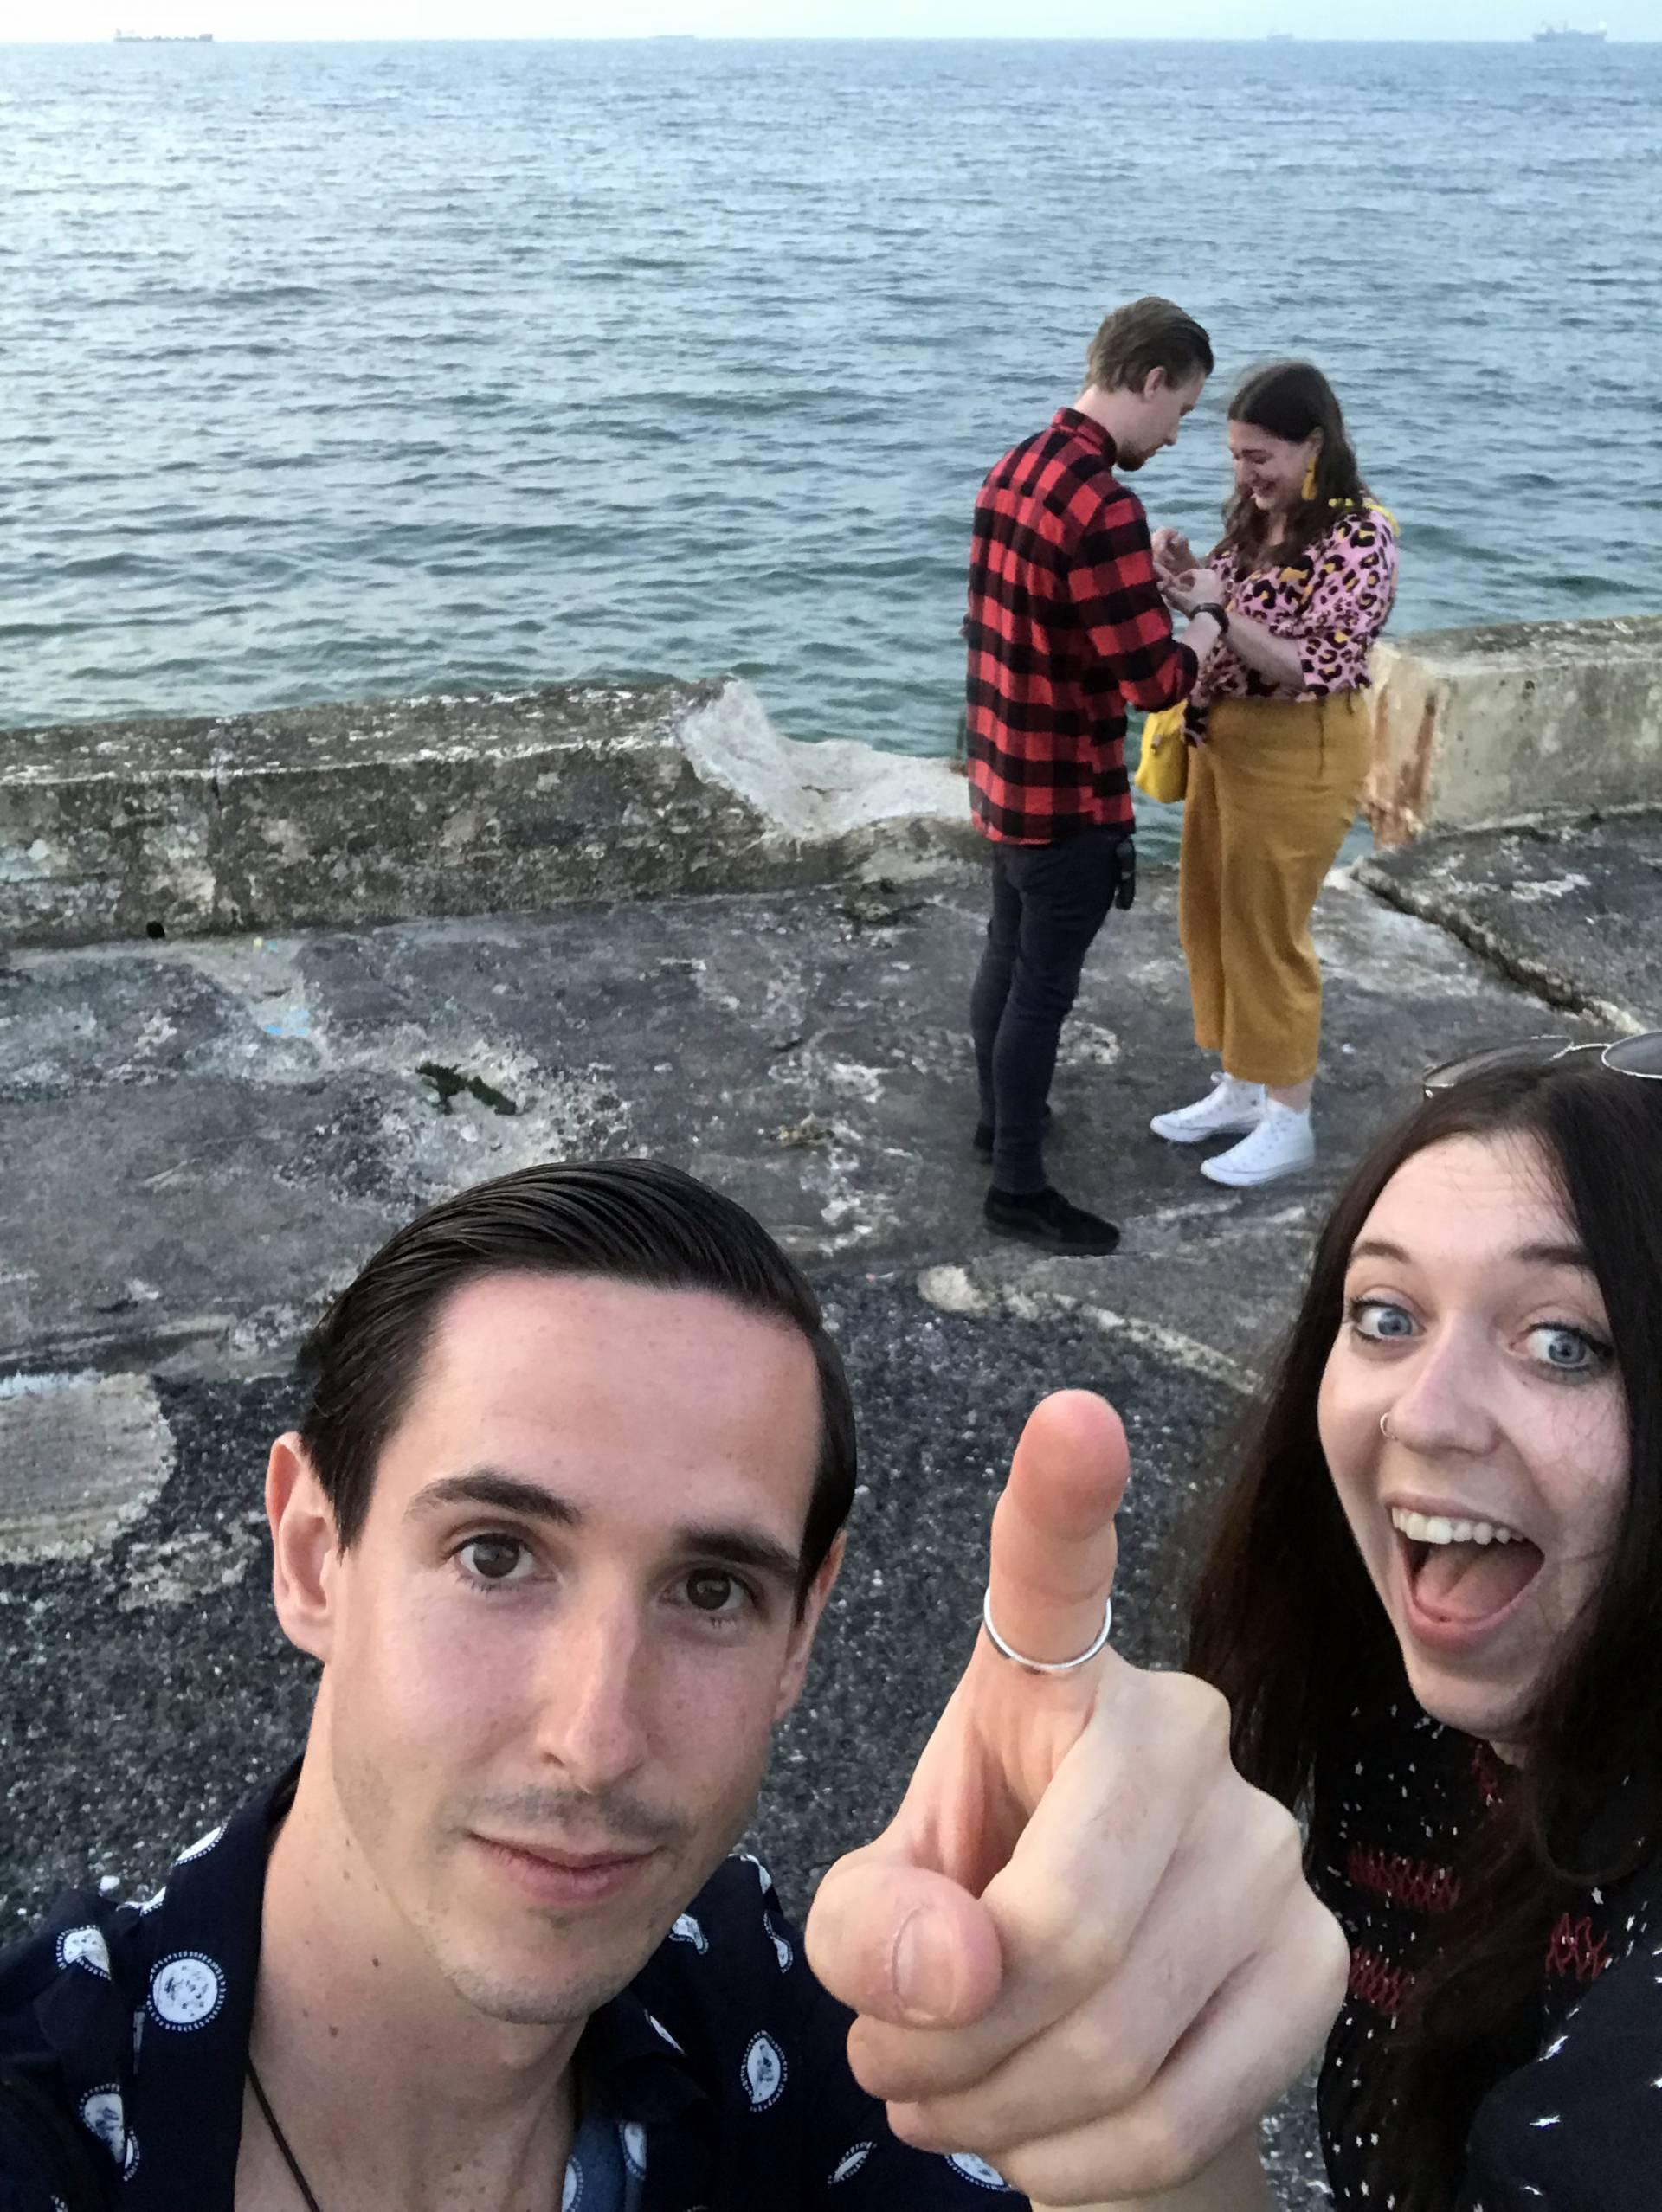 Engagement story selfie